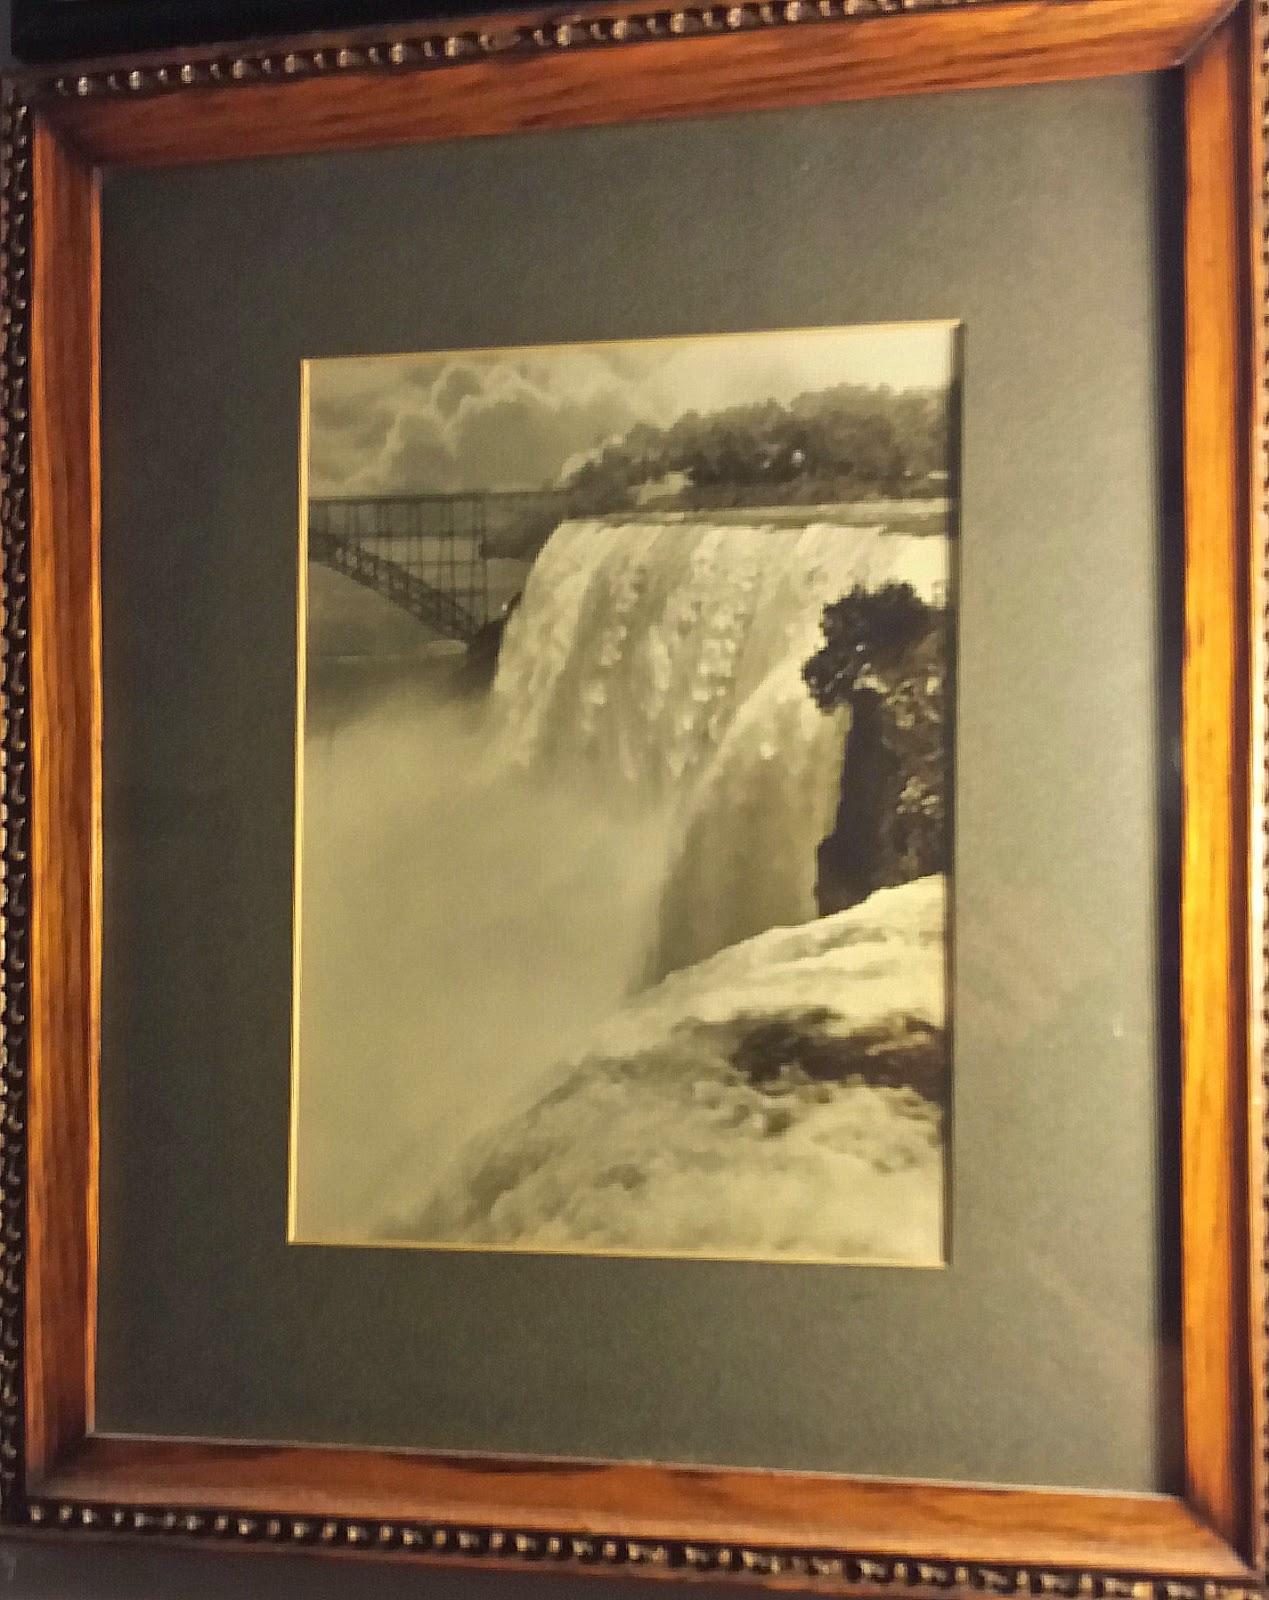 Niagara_Falls_1920